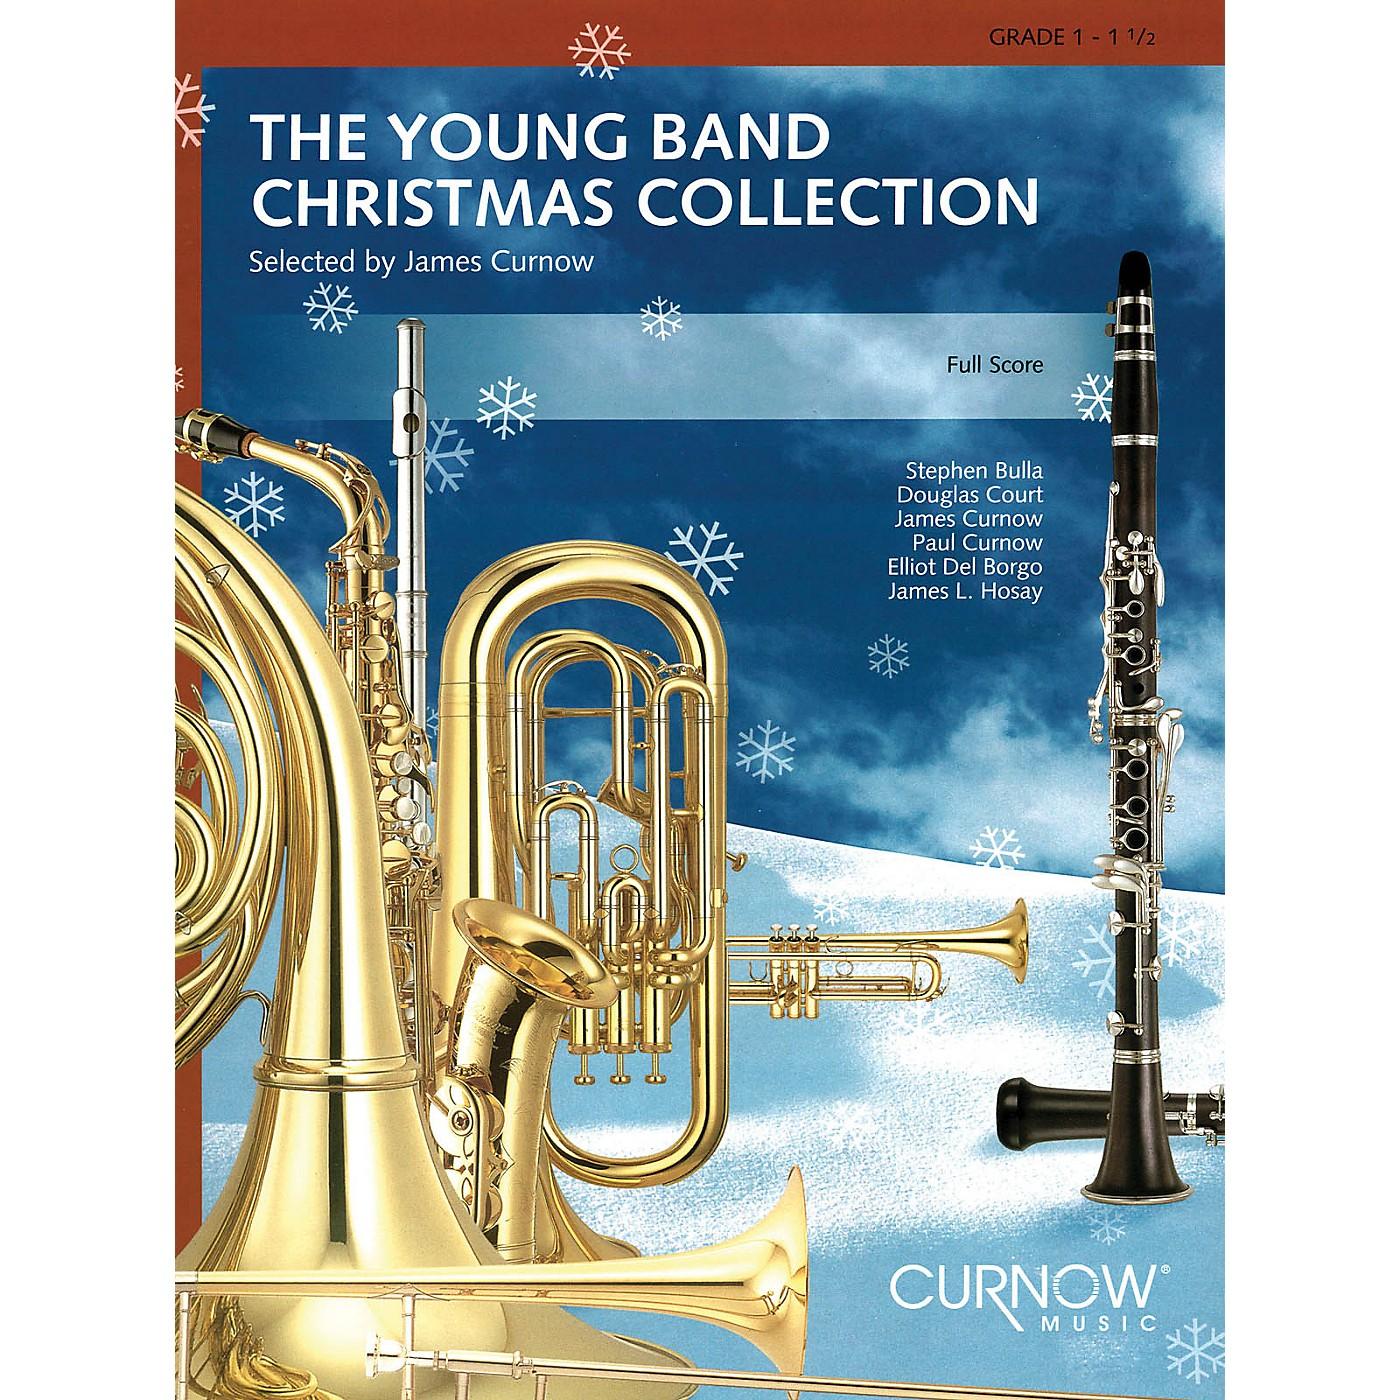 Curnow Music Young Band Christmas Collection (Grade 1.5) (Timpani) Concert Band thumbnail